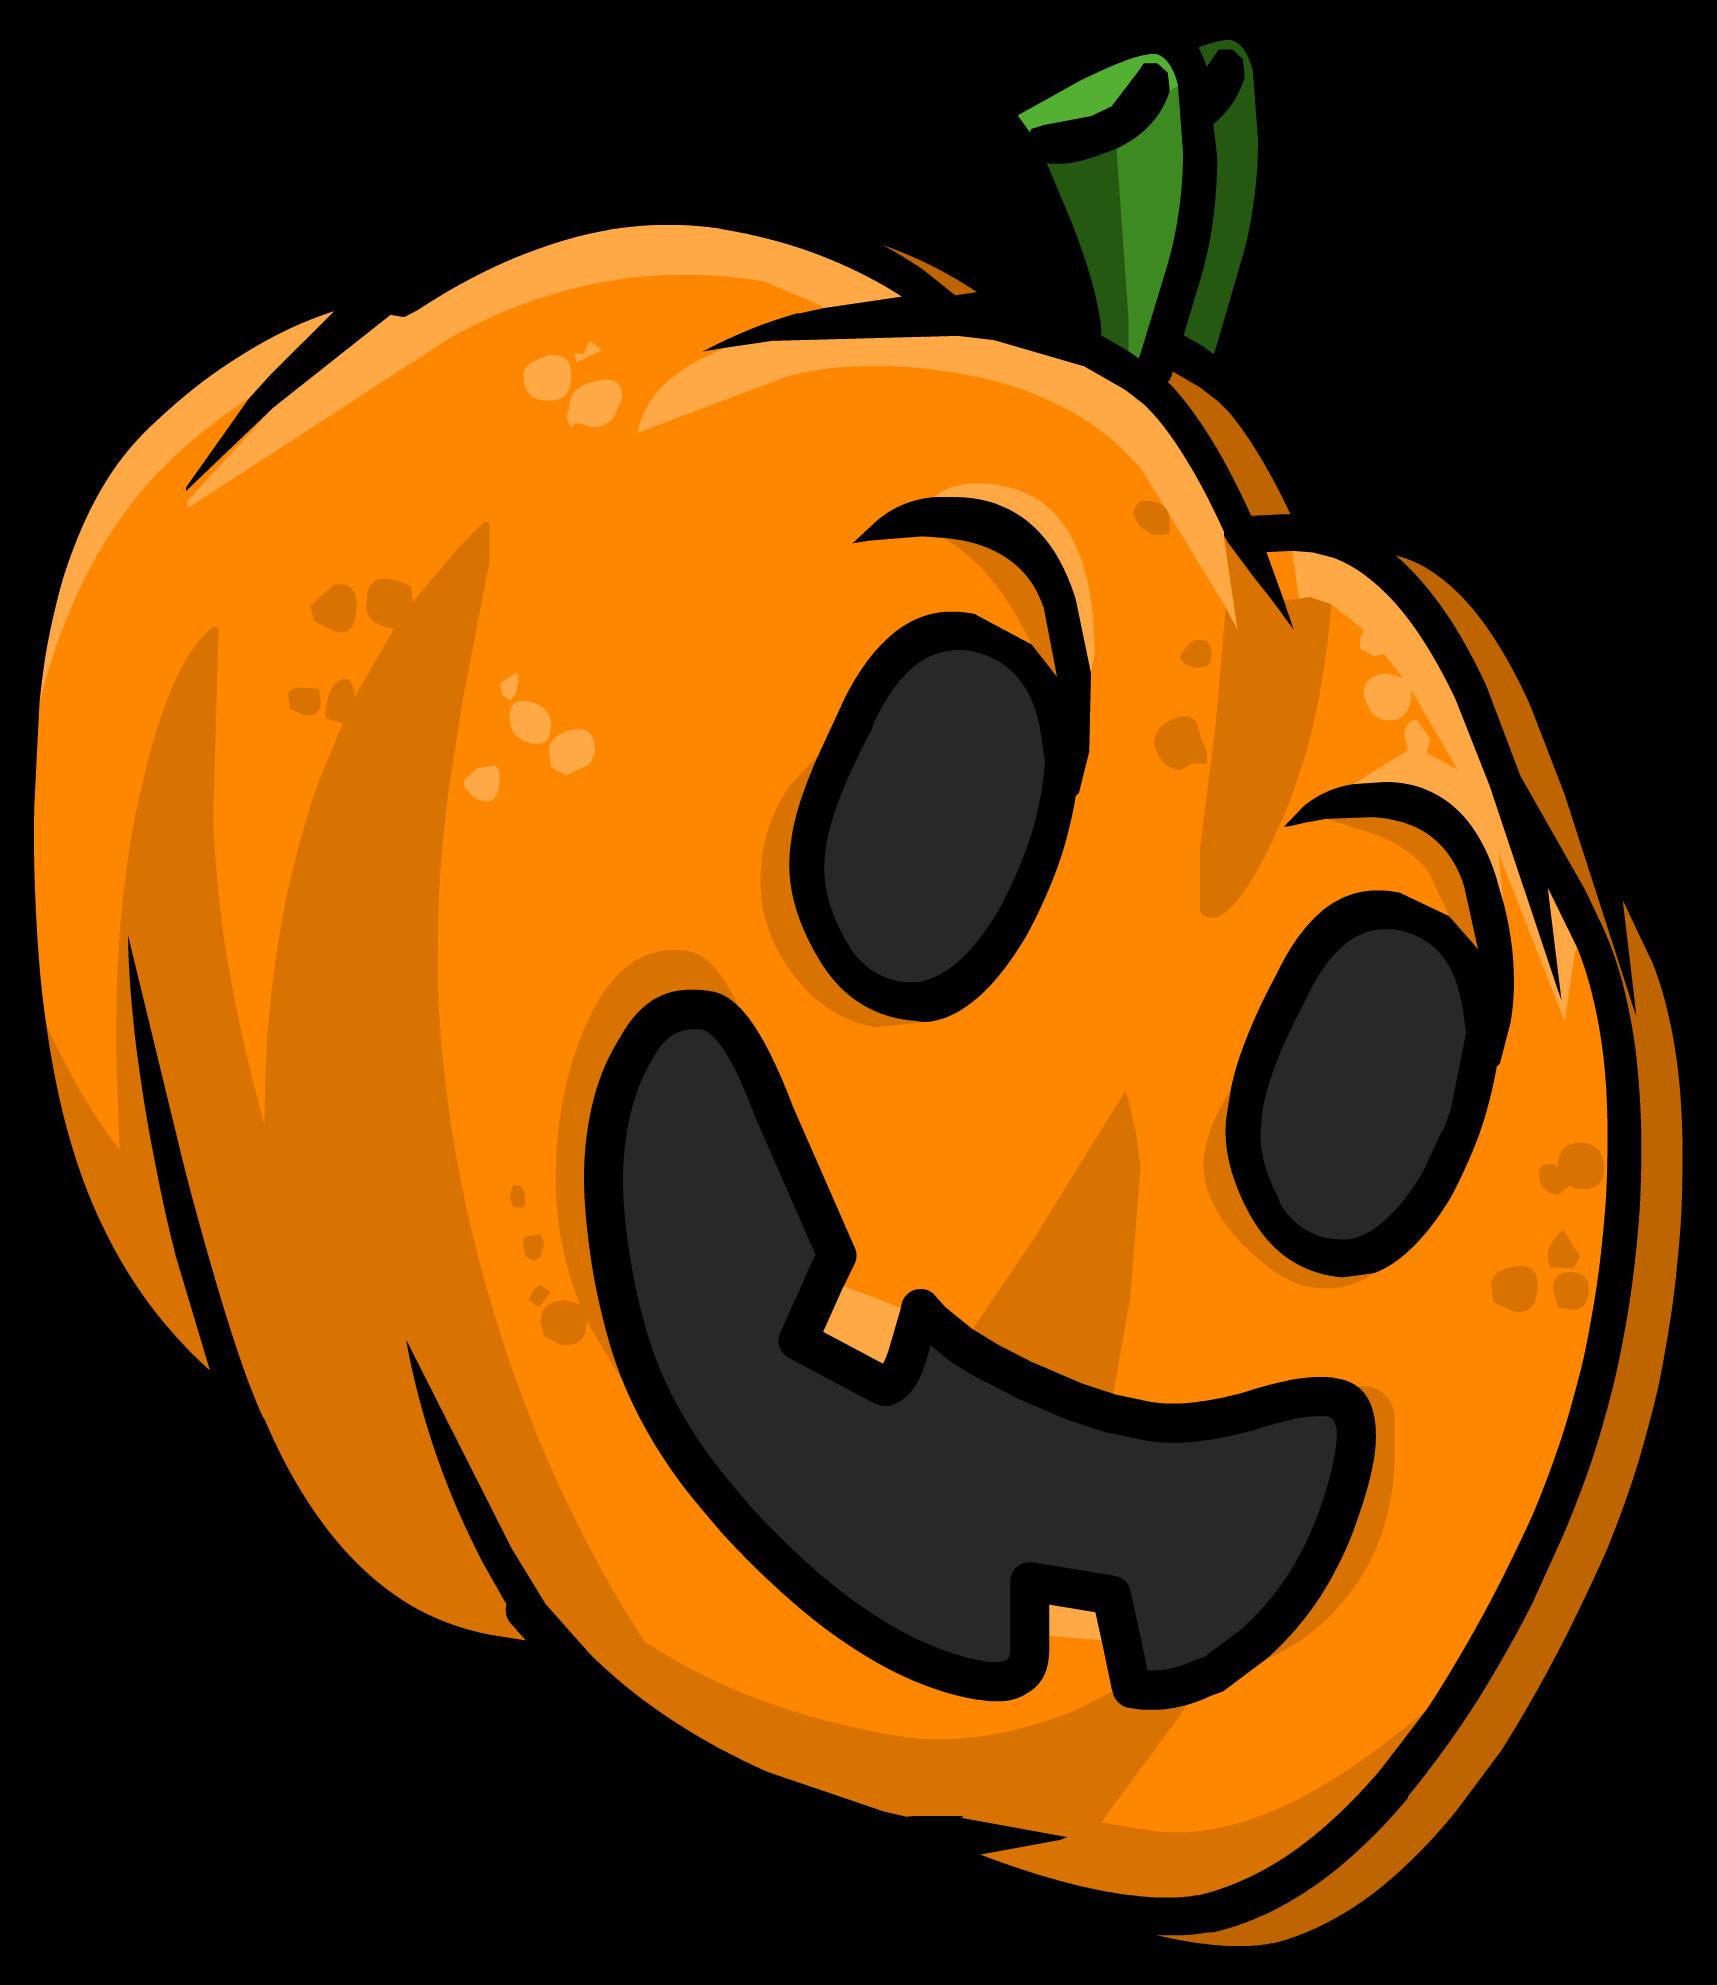 Deep green pumpkin clipart png freeuse download Image - Wall Pumpkin sprite 003.png | Club Penguin Wiki | FANDOM ... png freeuse download